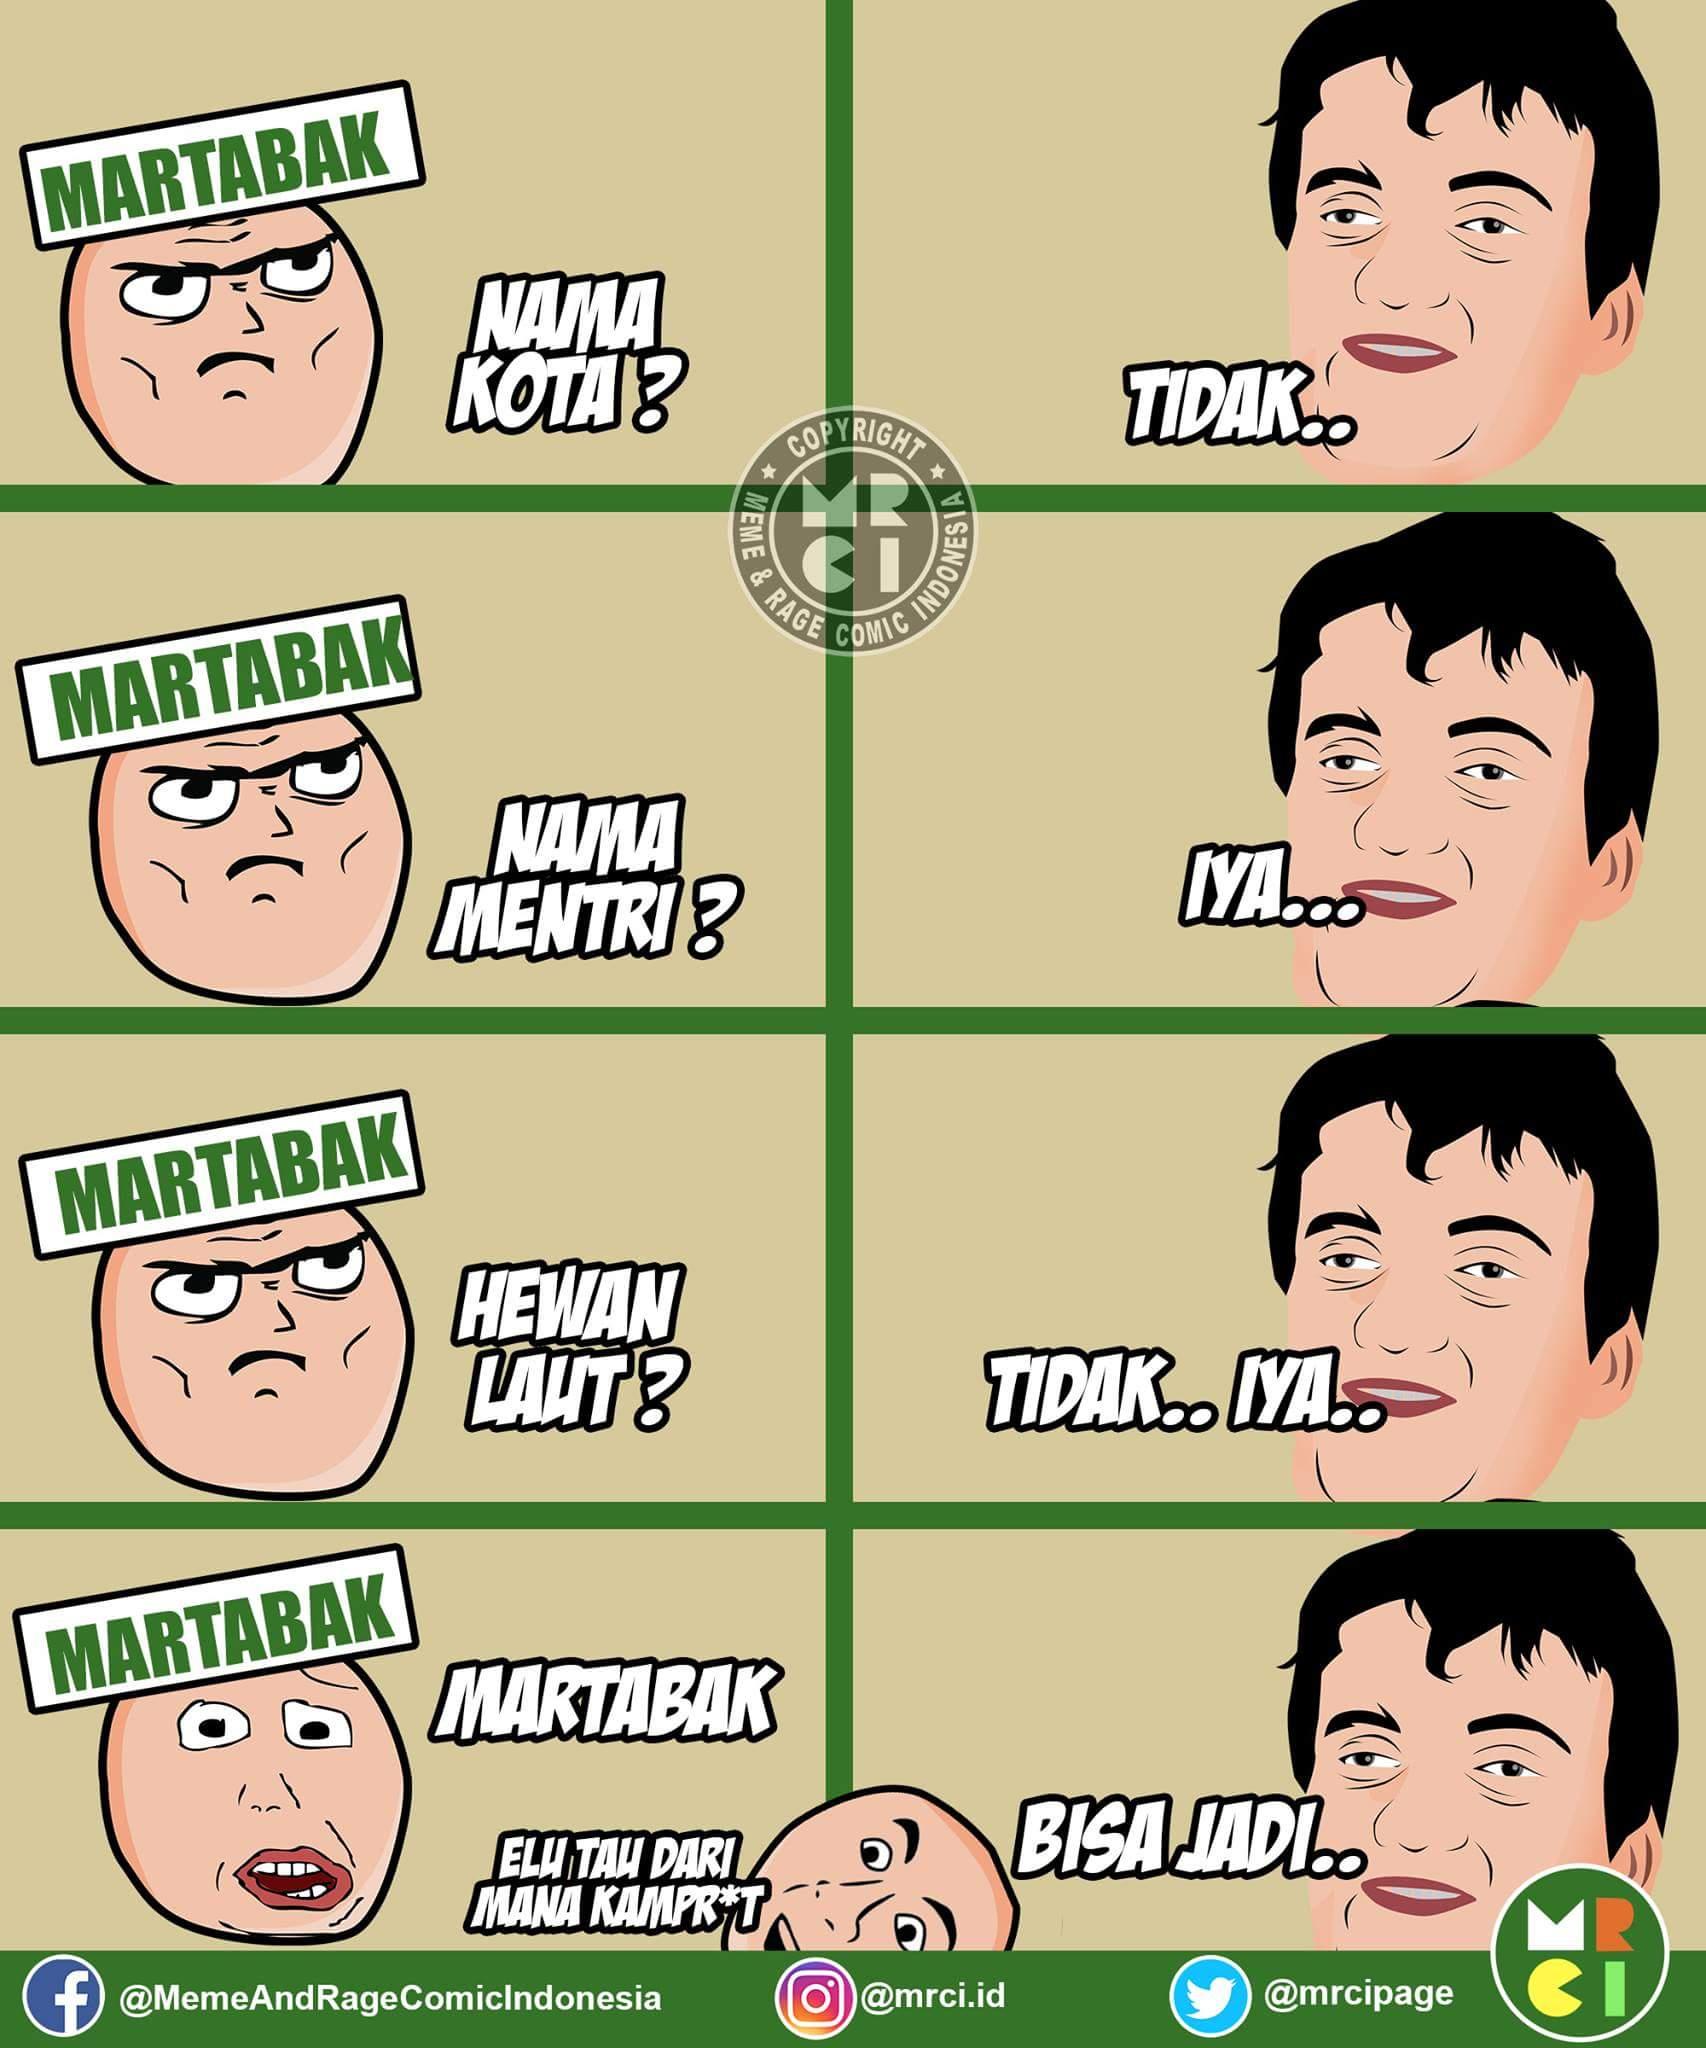 Meme Comic Lucu Herp Kumpulan Gambar DP BBM Manchester United Terbaru